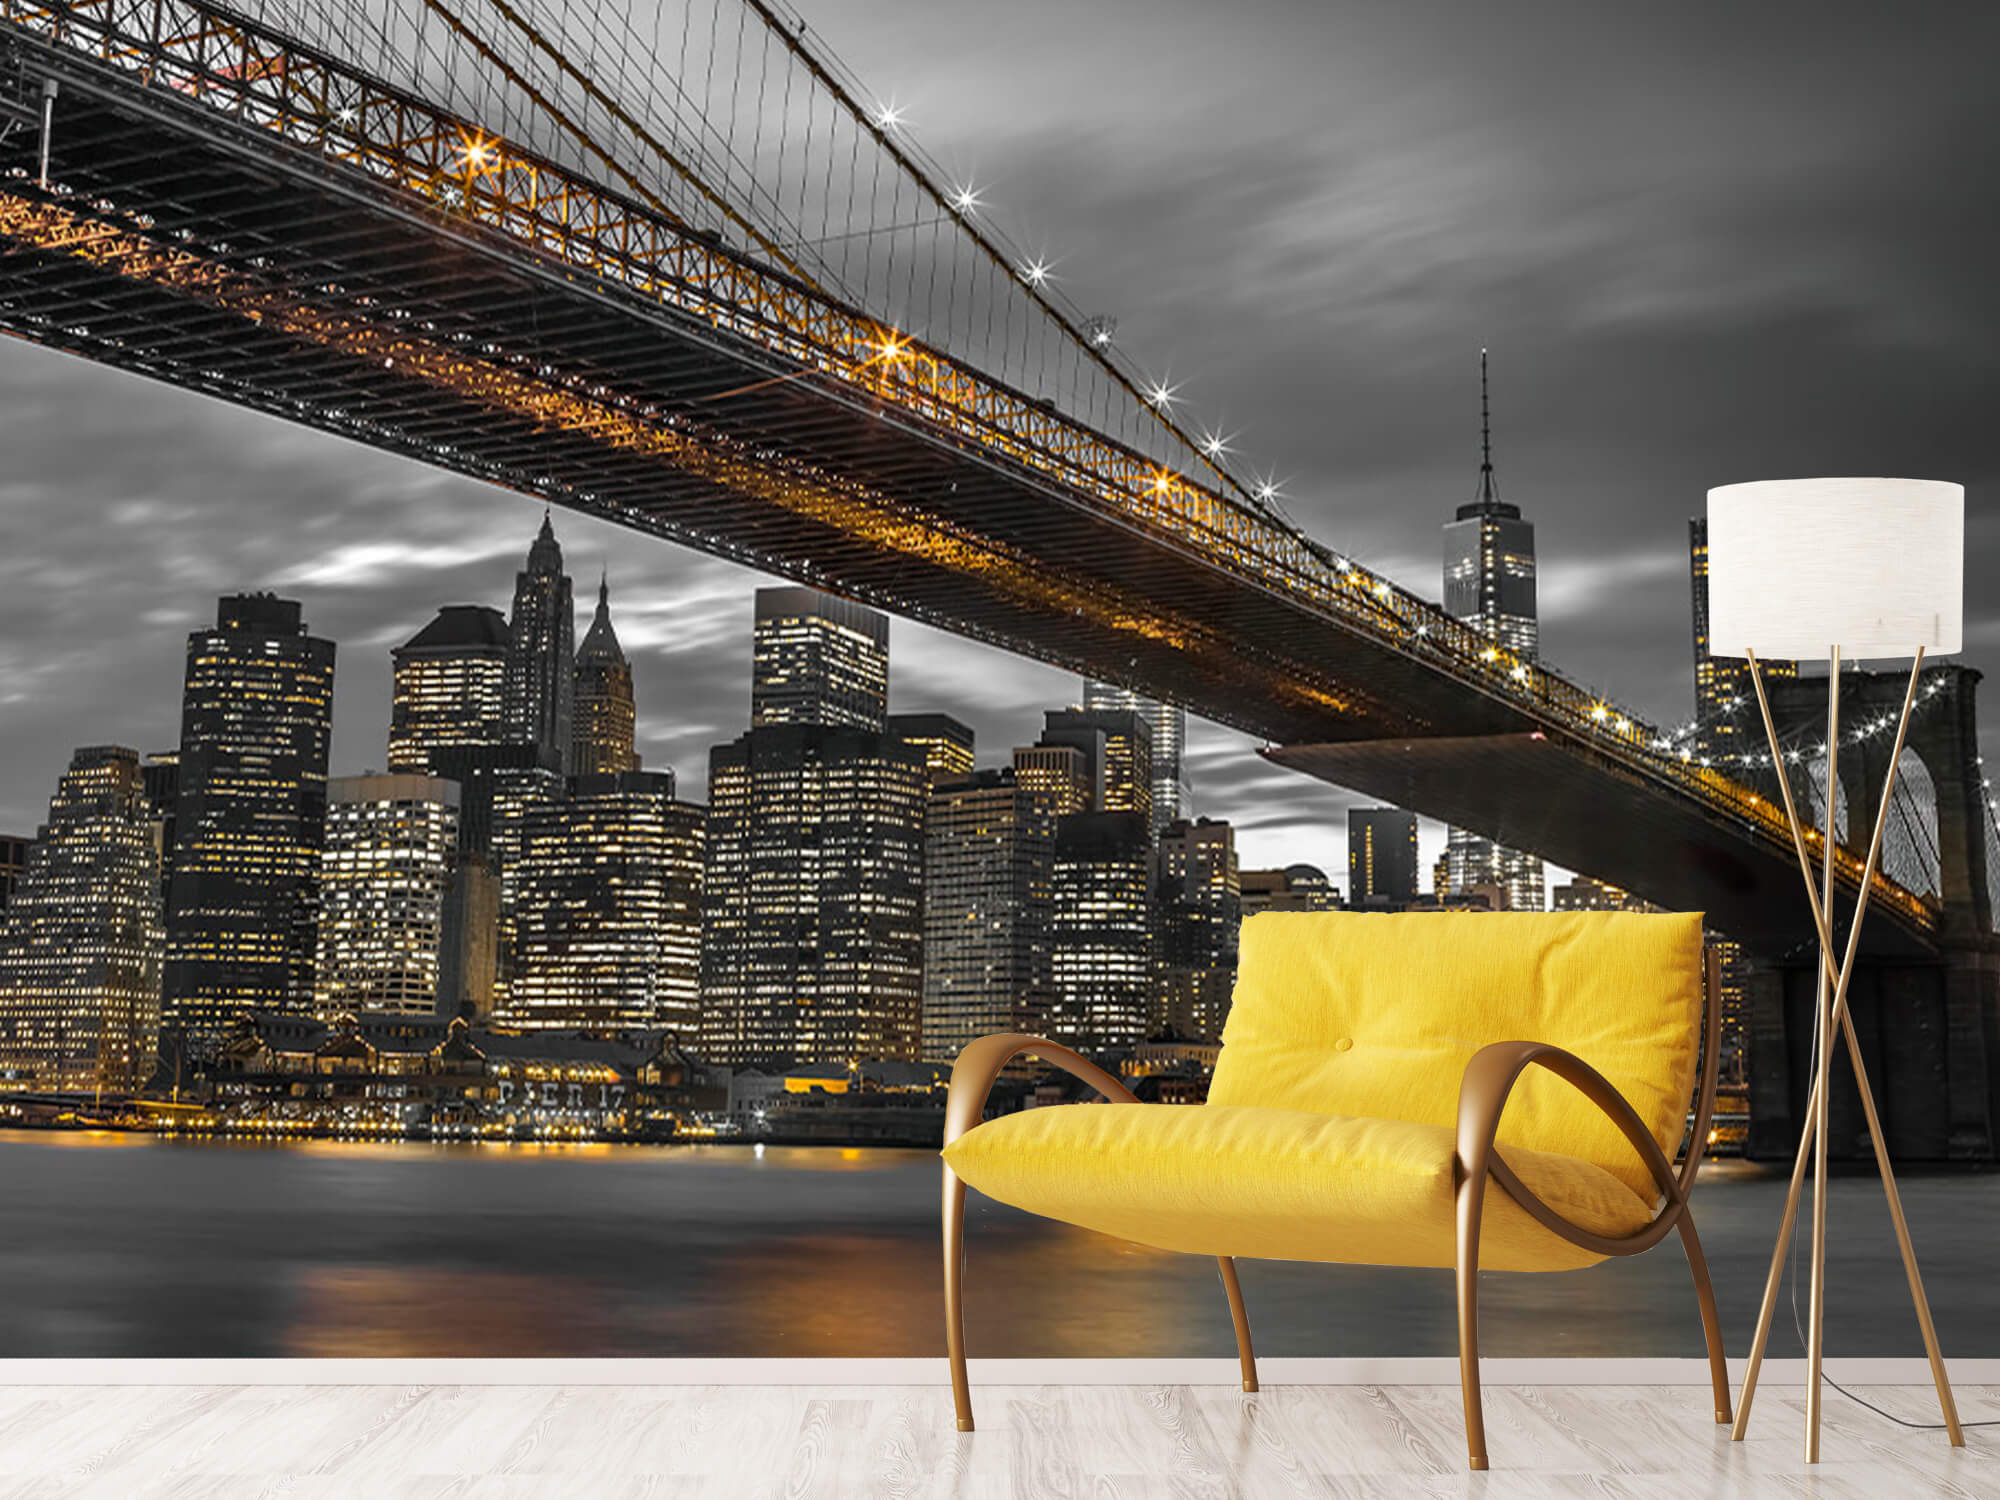 Brooklyn Bridge, New York 2